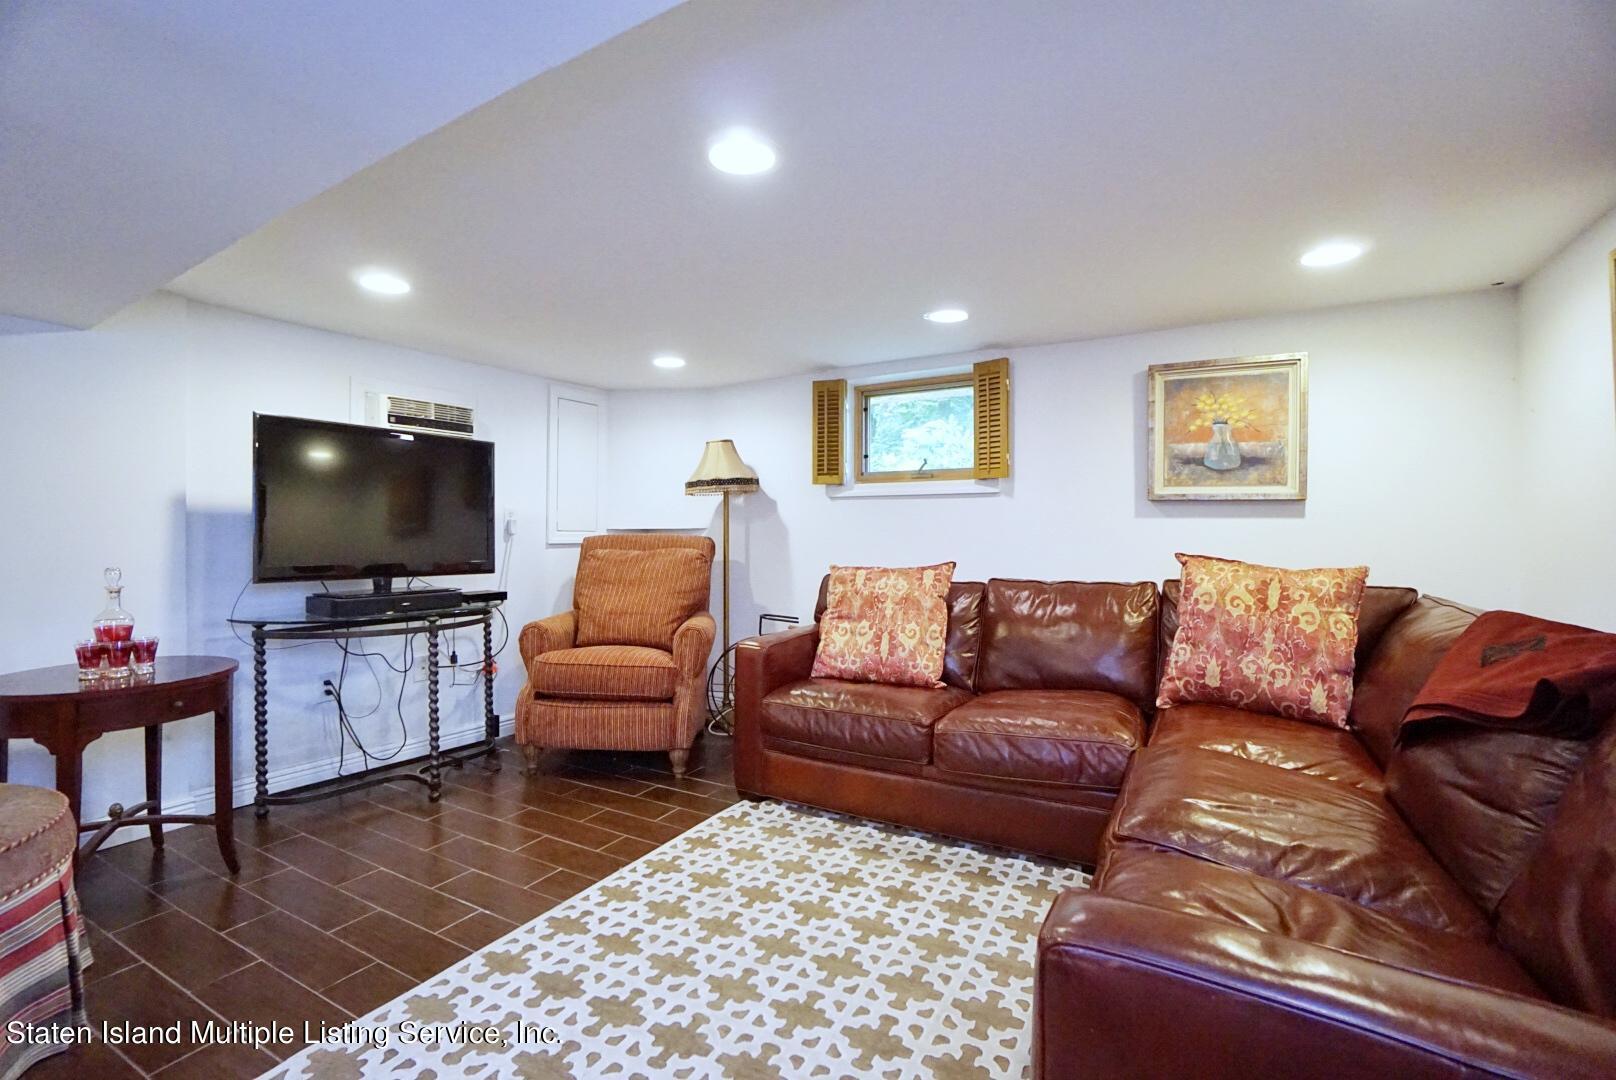 Single Family - Detached 311 Bement Avenue  Staten Island, NY 10310, MLS-1147133-34